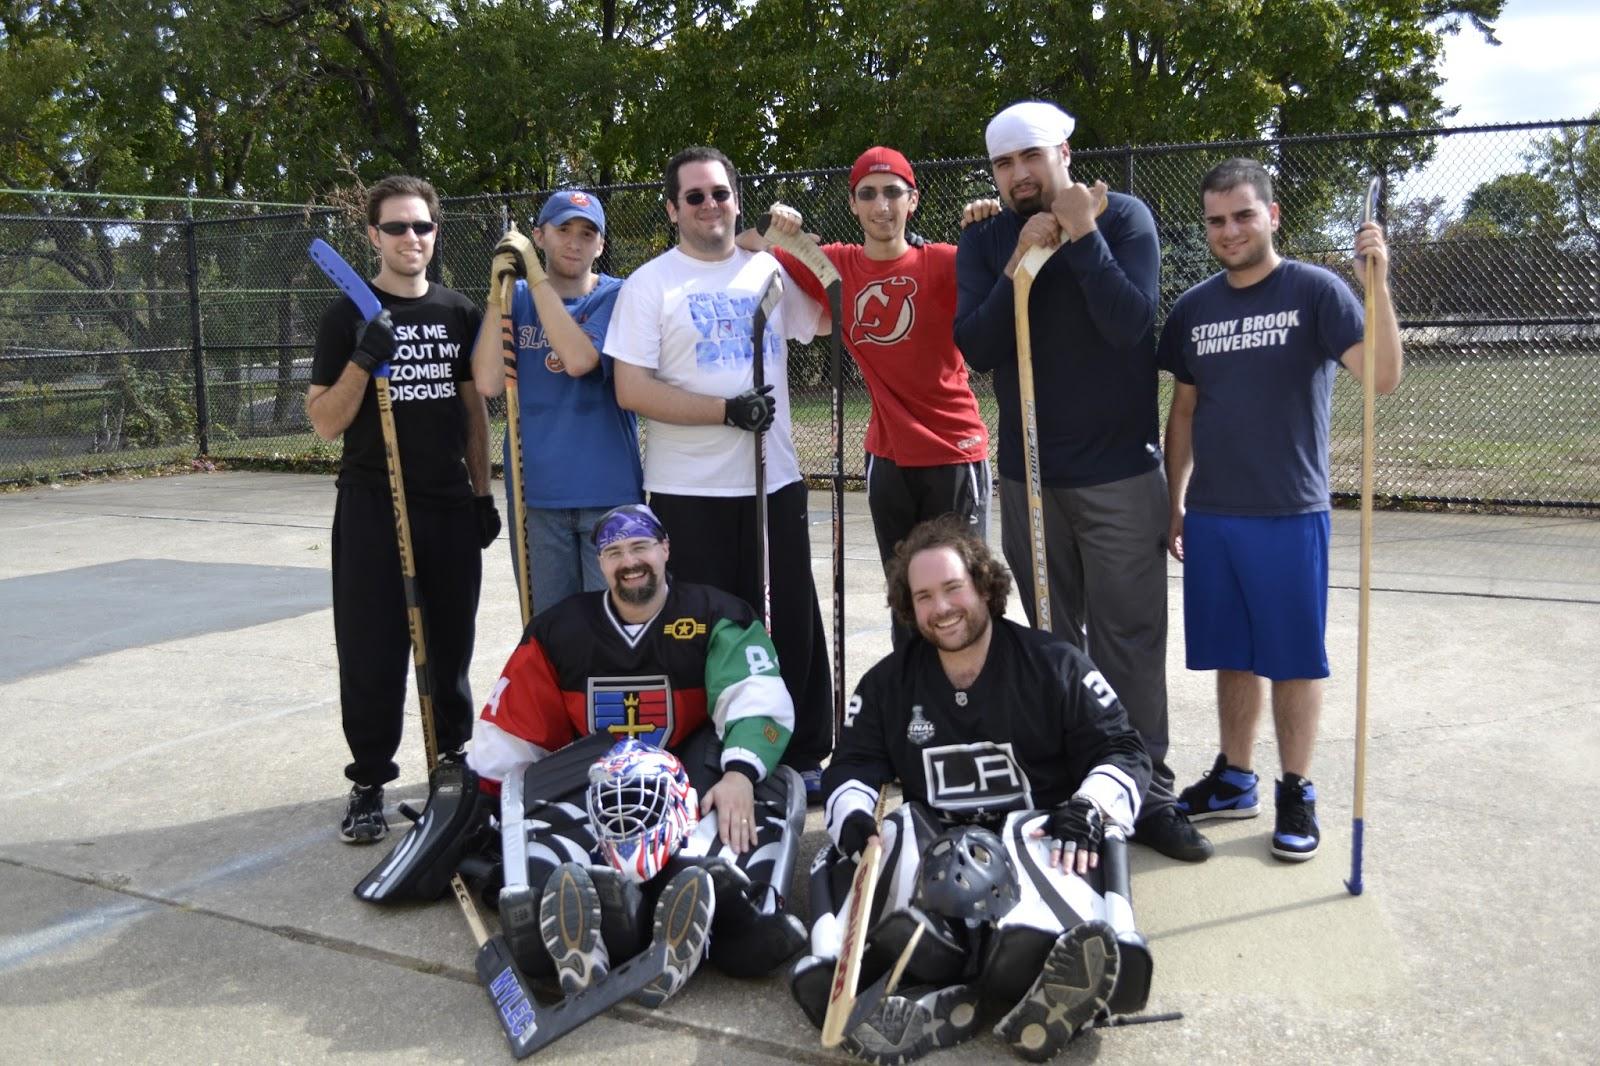 Long Island Queens Street Hockey League: The LIQ: About Us